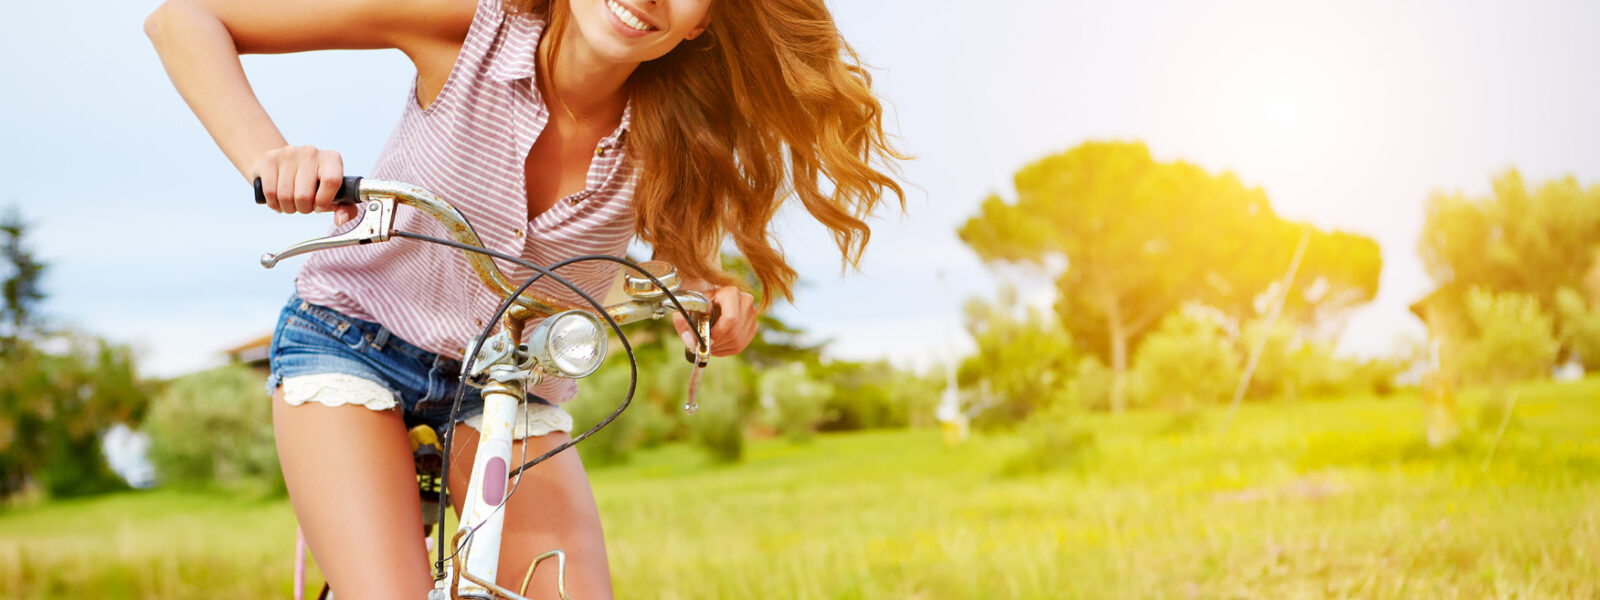 Advanced Wellness and Rejuvenation Announces Lipo Plus Injections